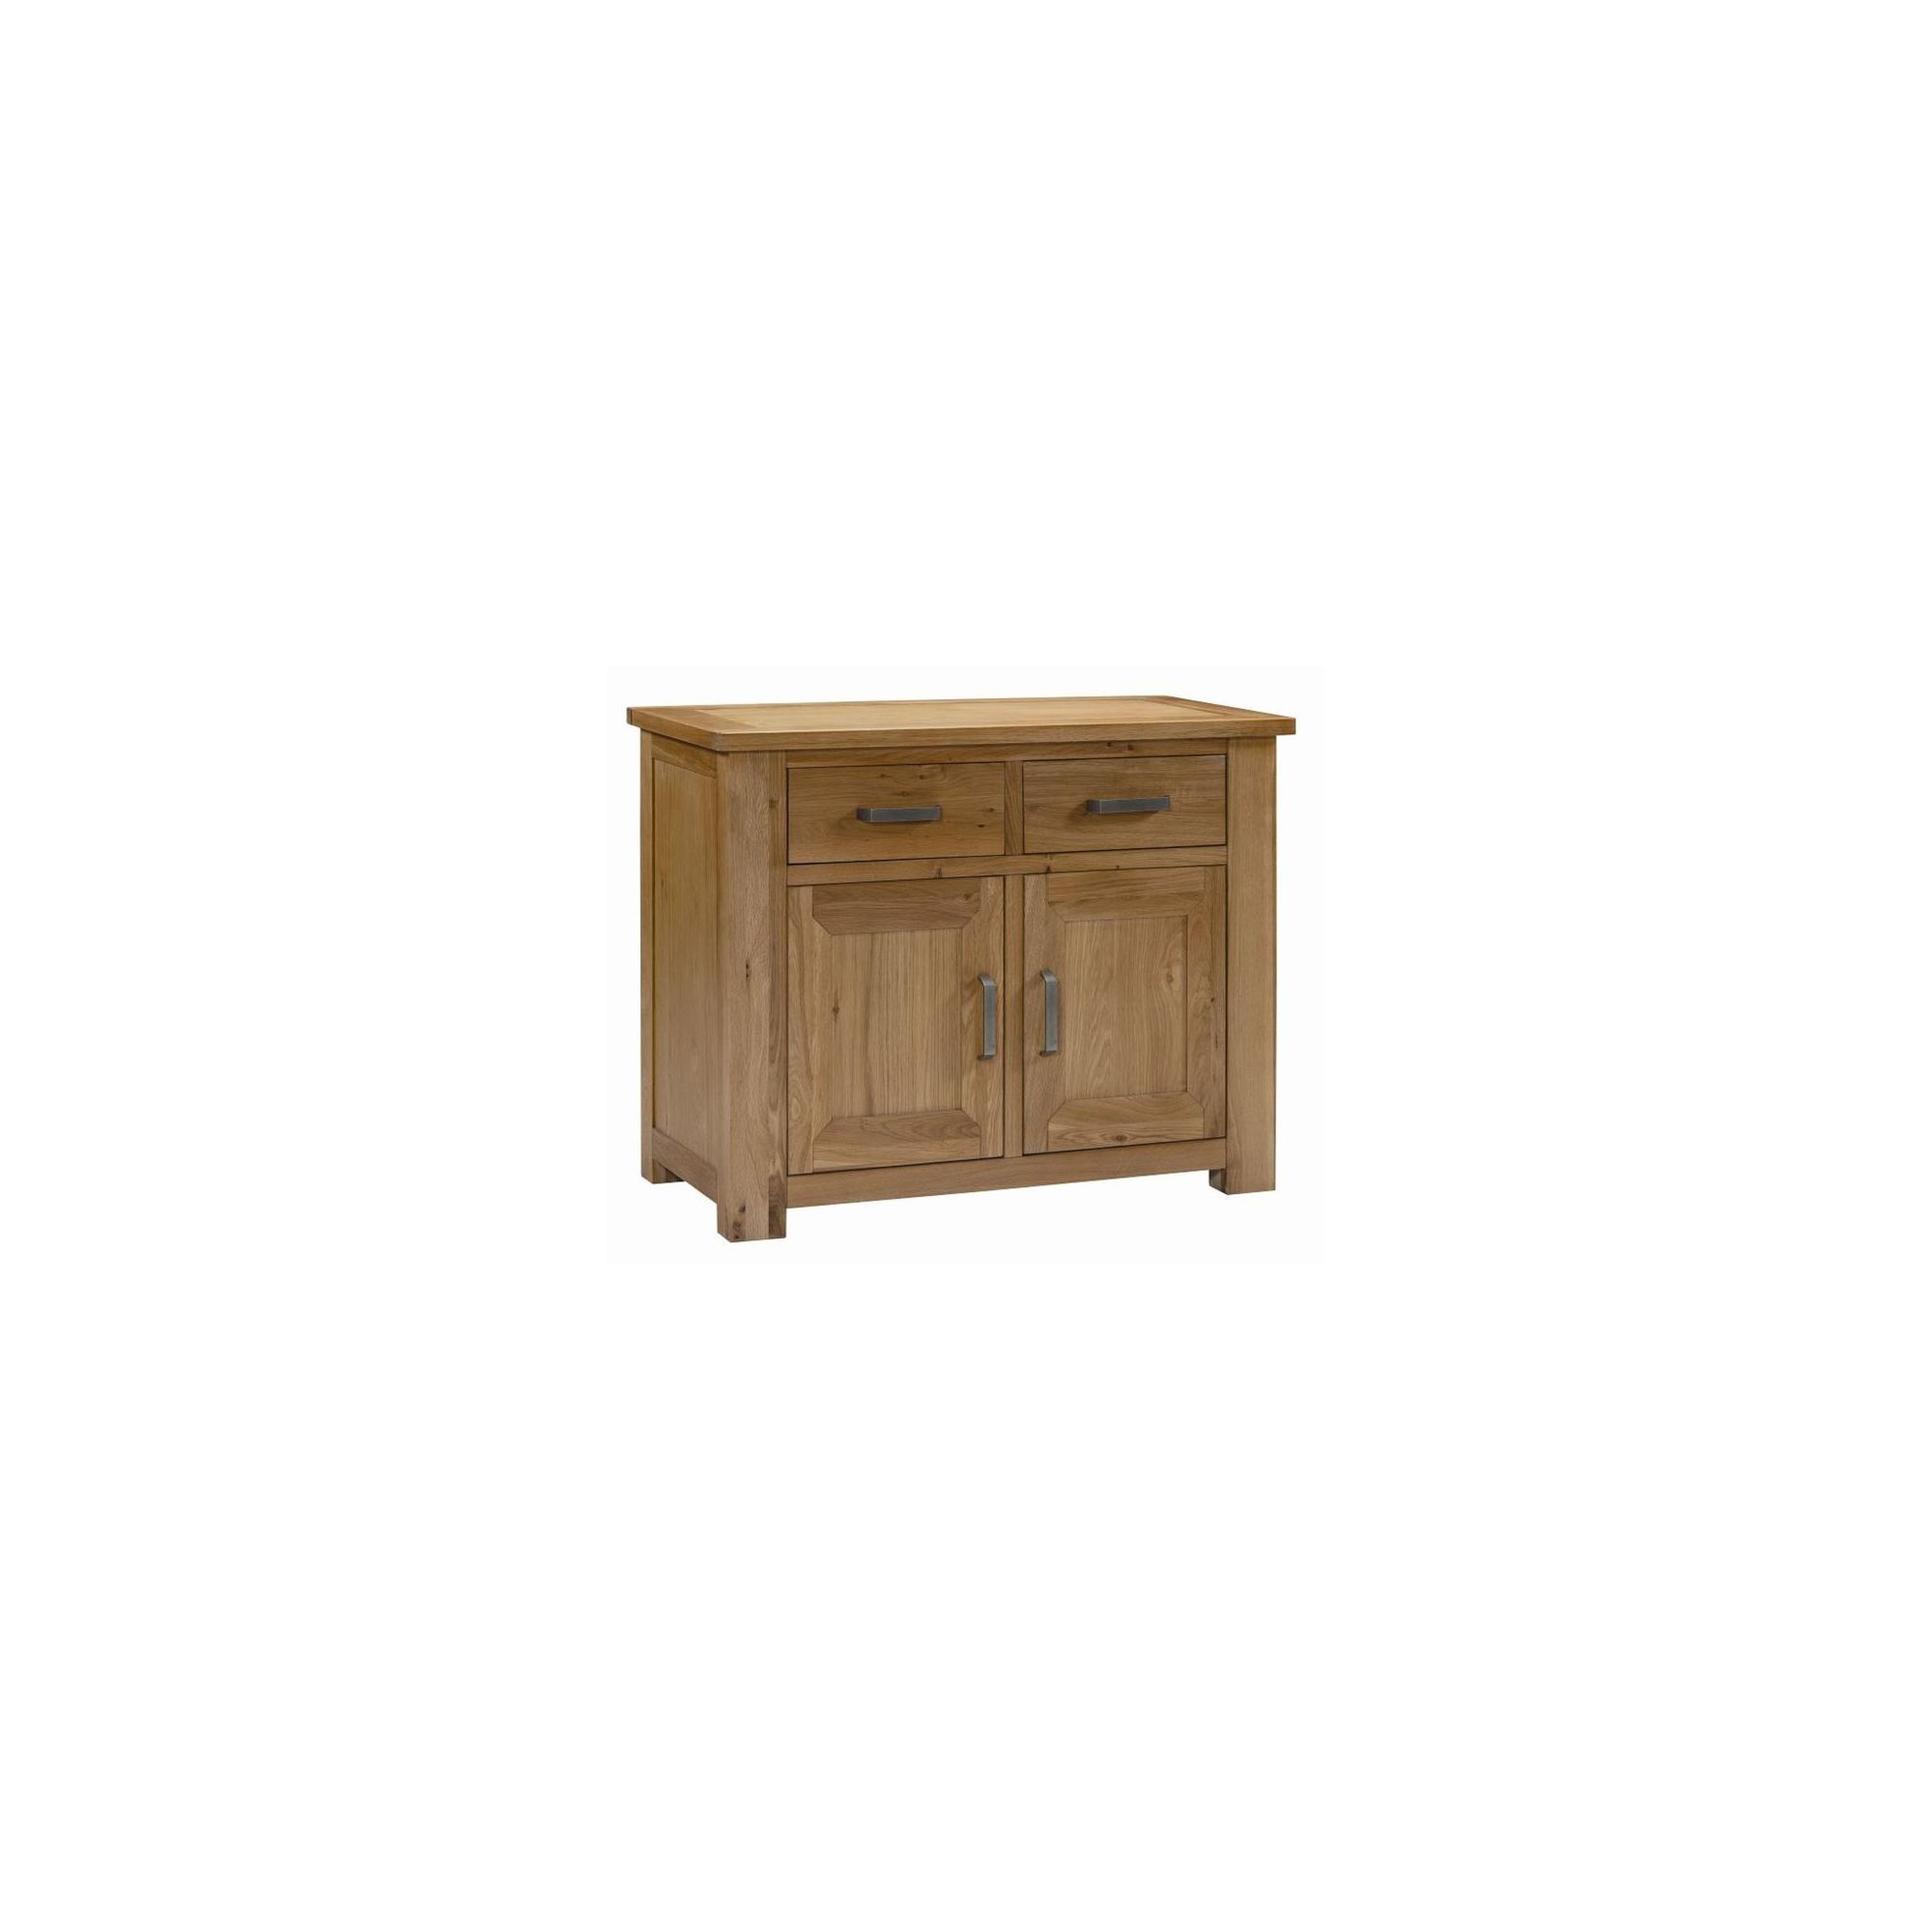 Kelburn Furniture Lyon Small Sideboard in Light Oak Matt Lacquer at Tesco Direct